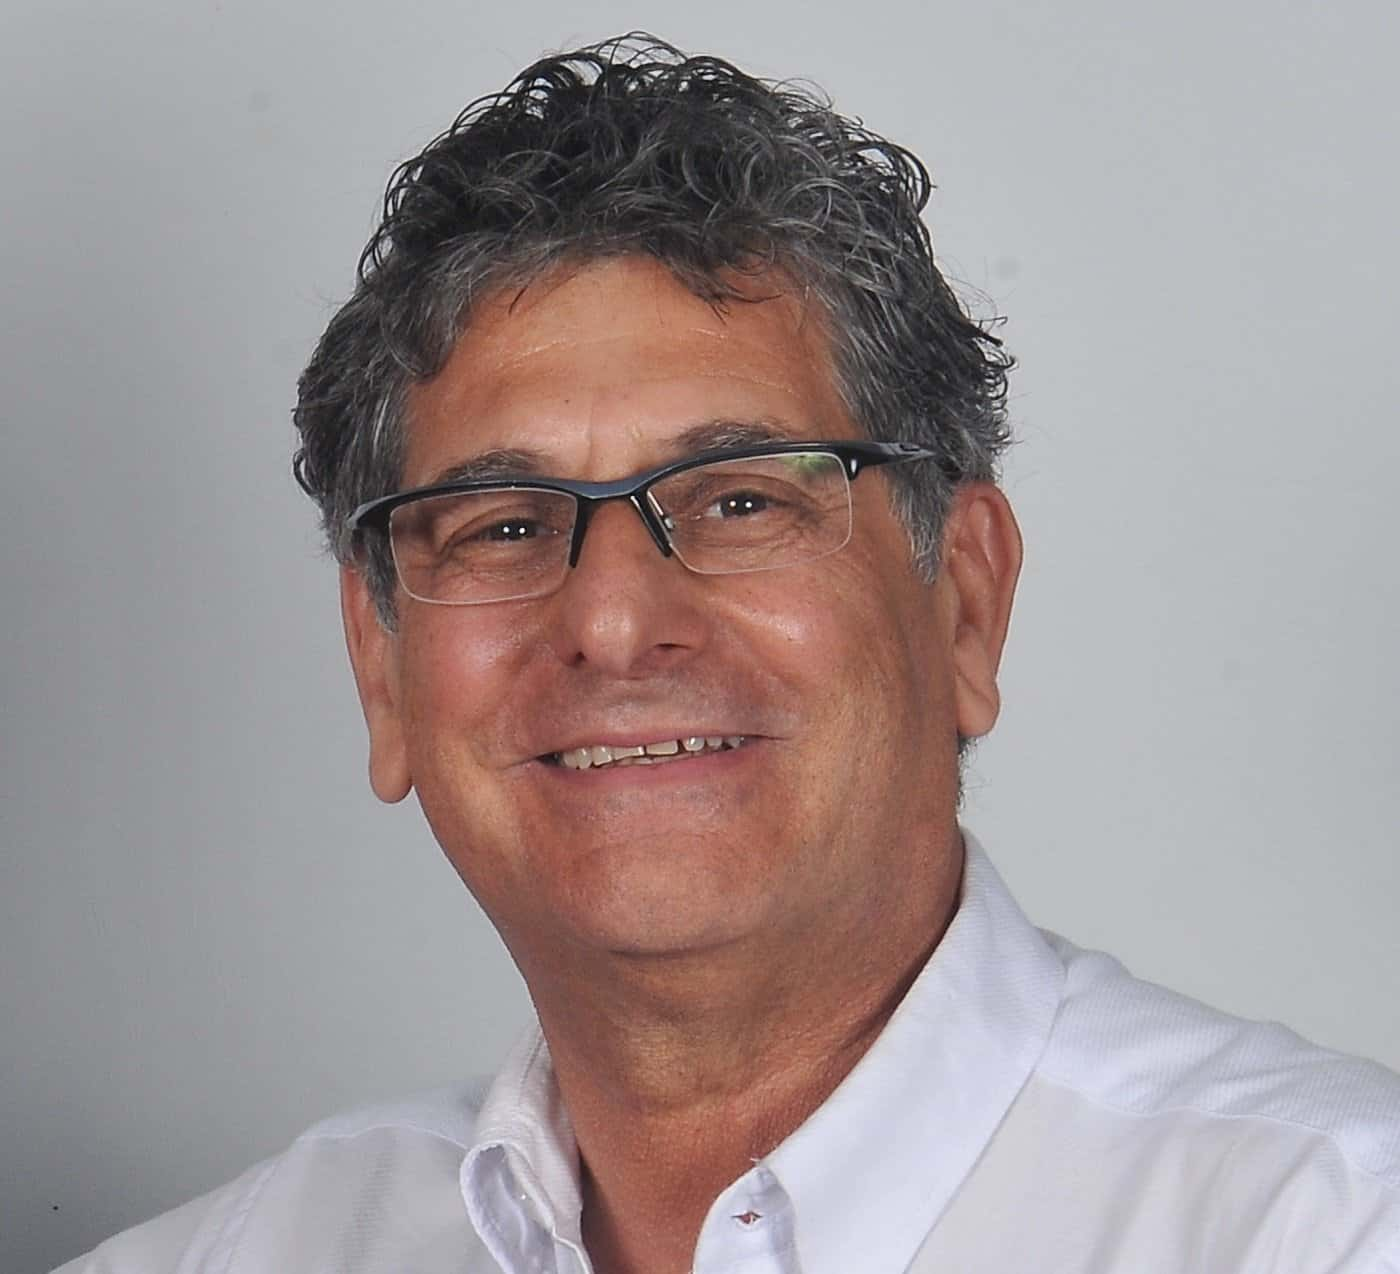 Nilton Moreira